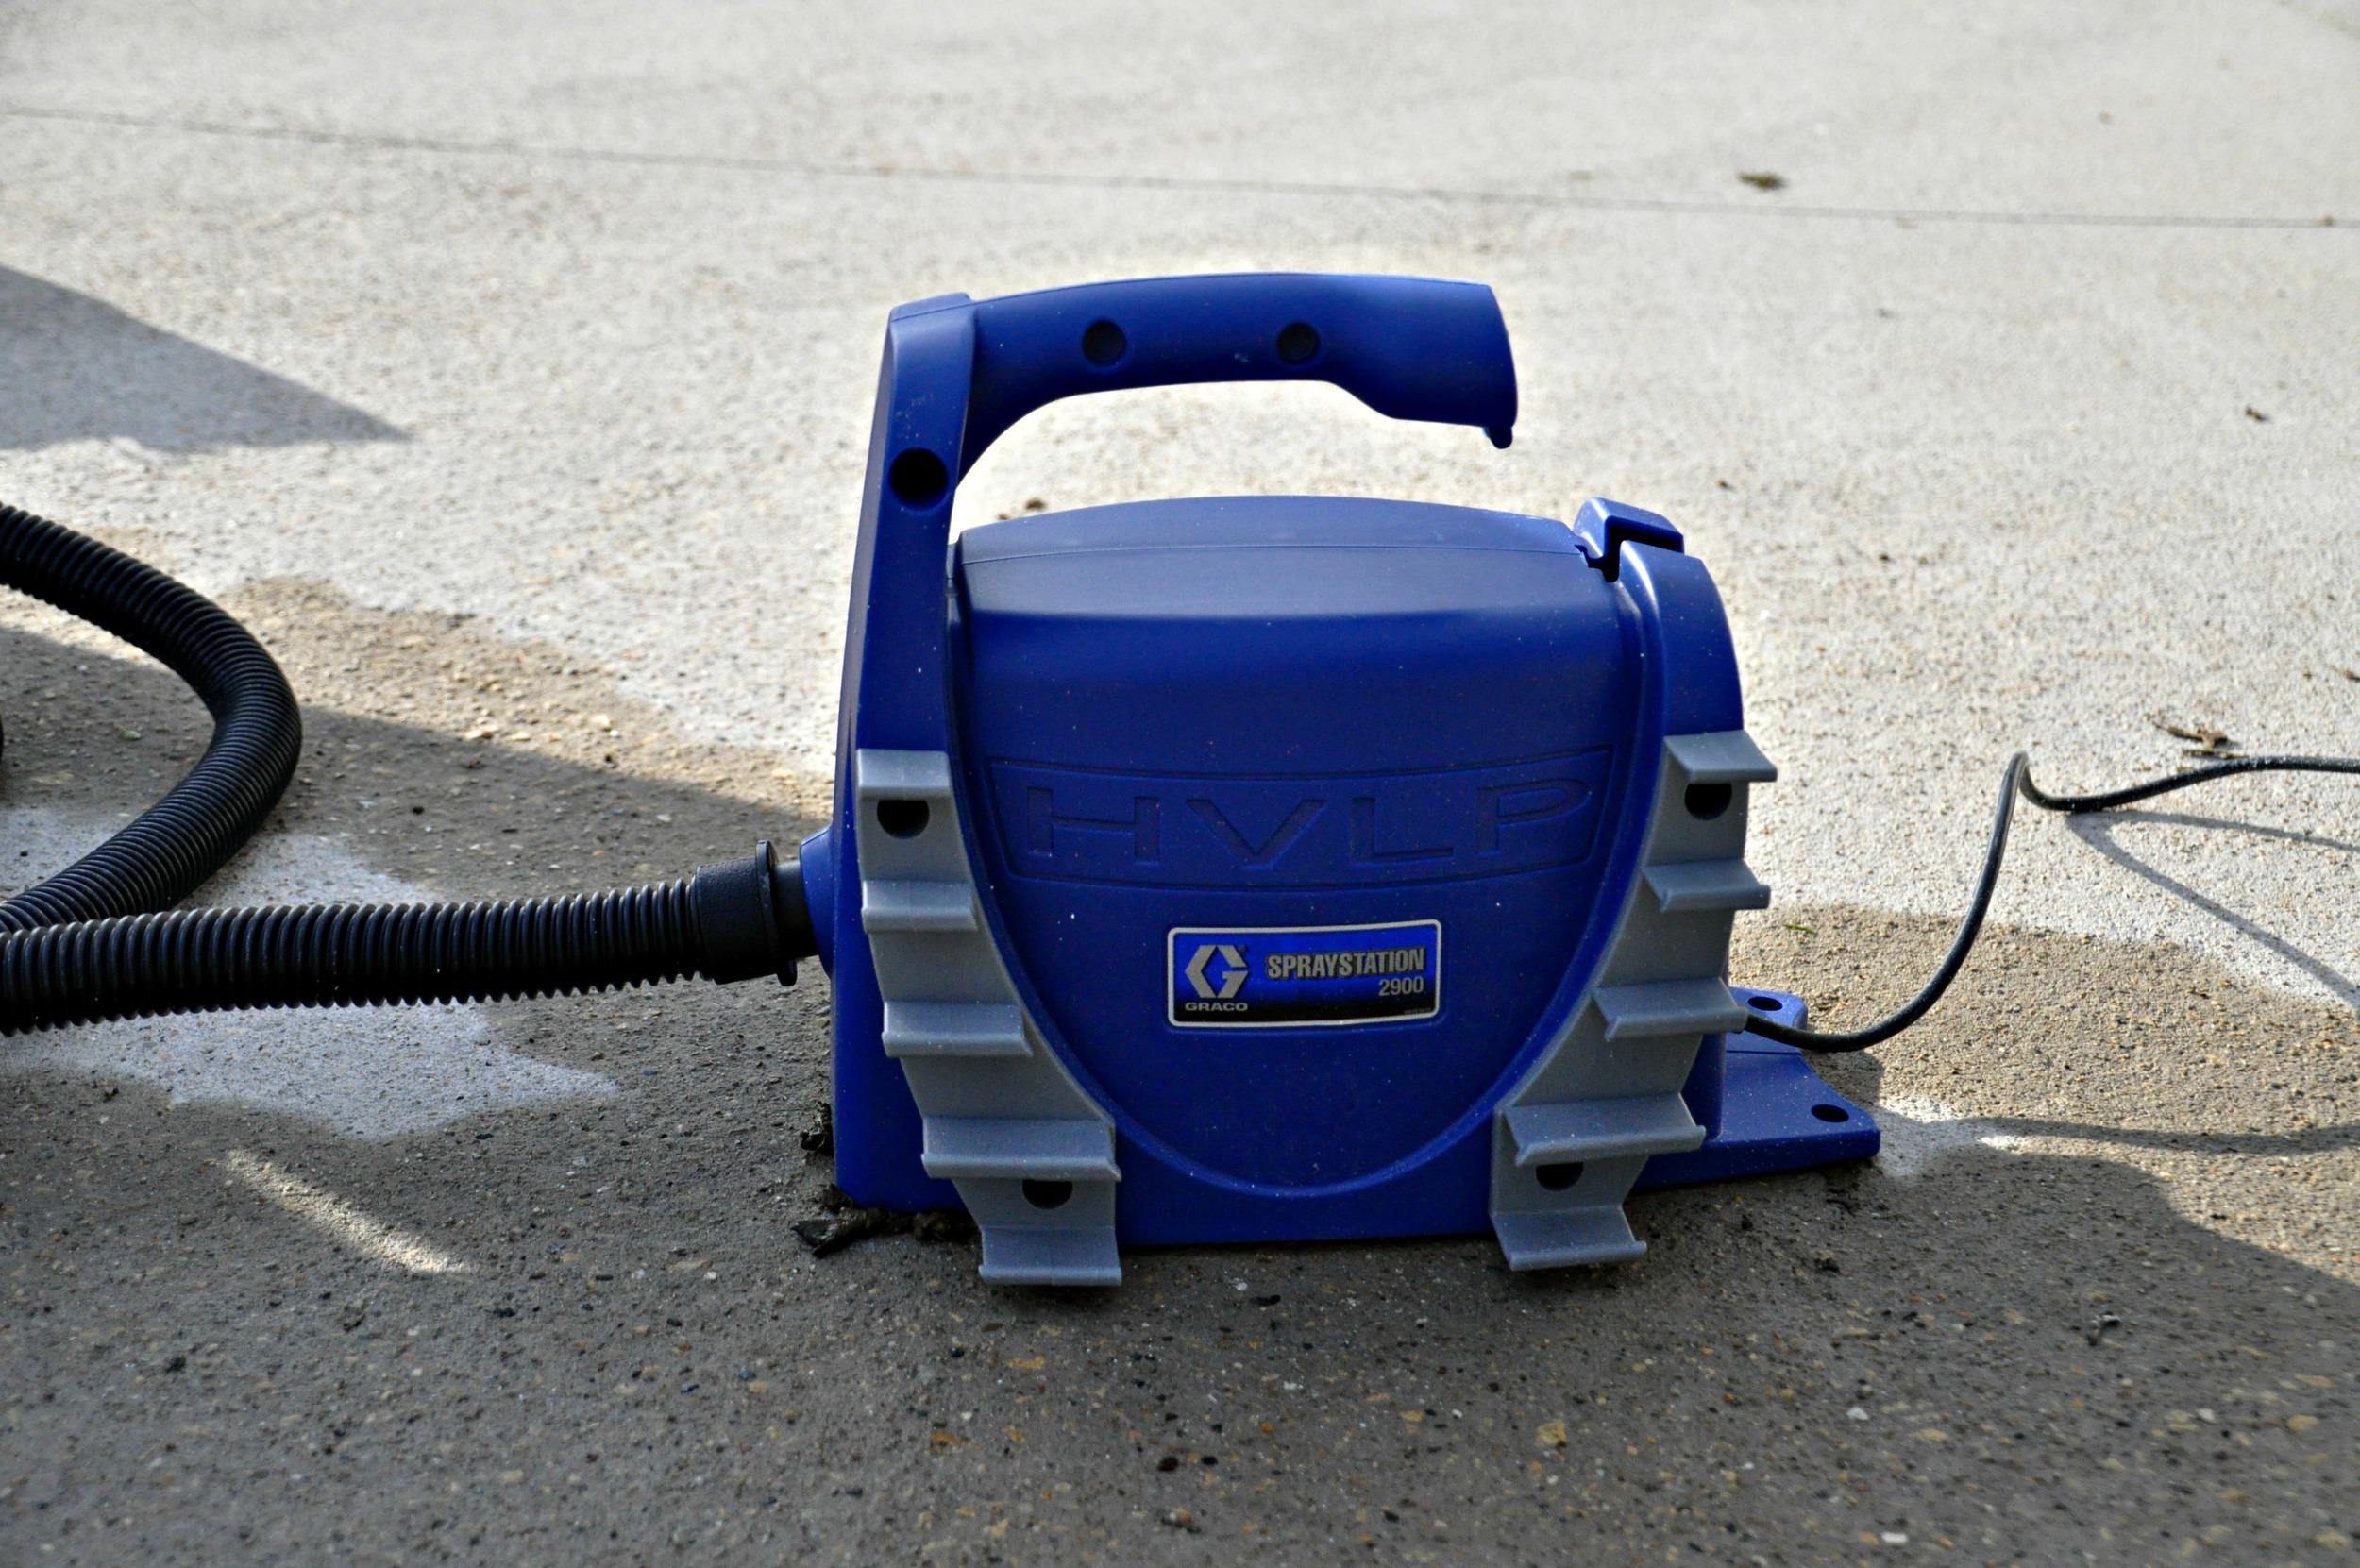 Graco Spraystation 2900.jpg